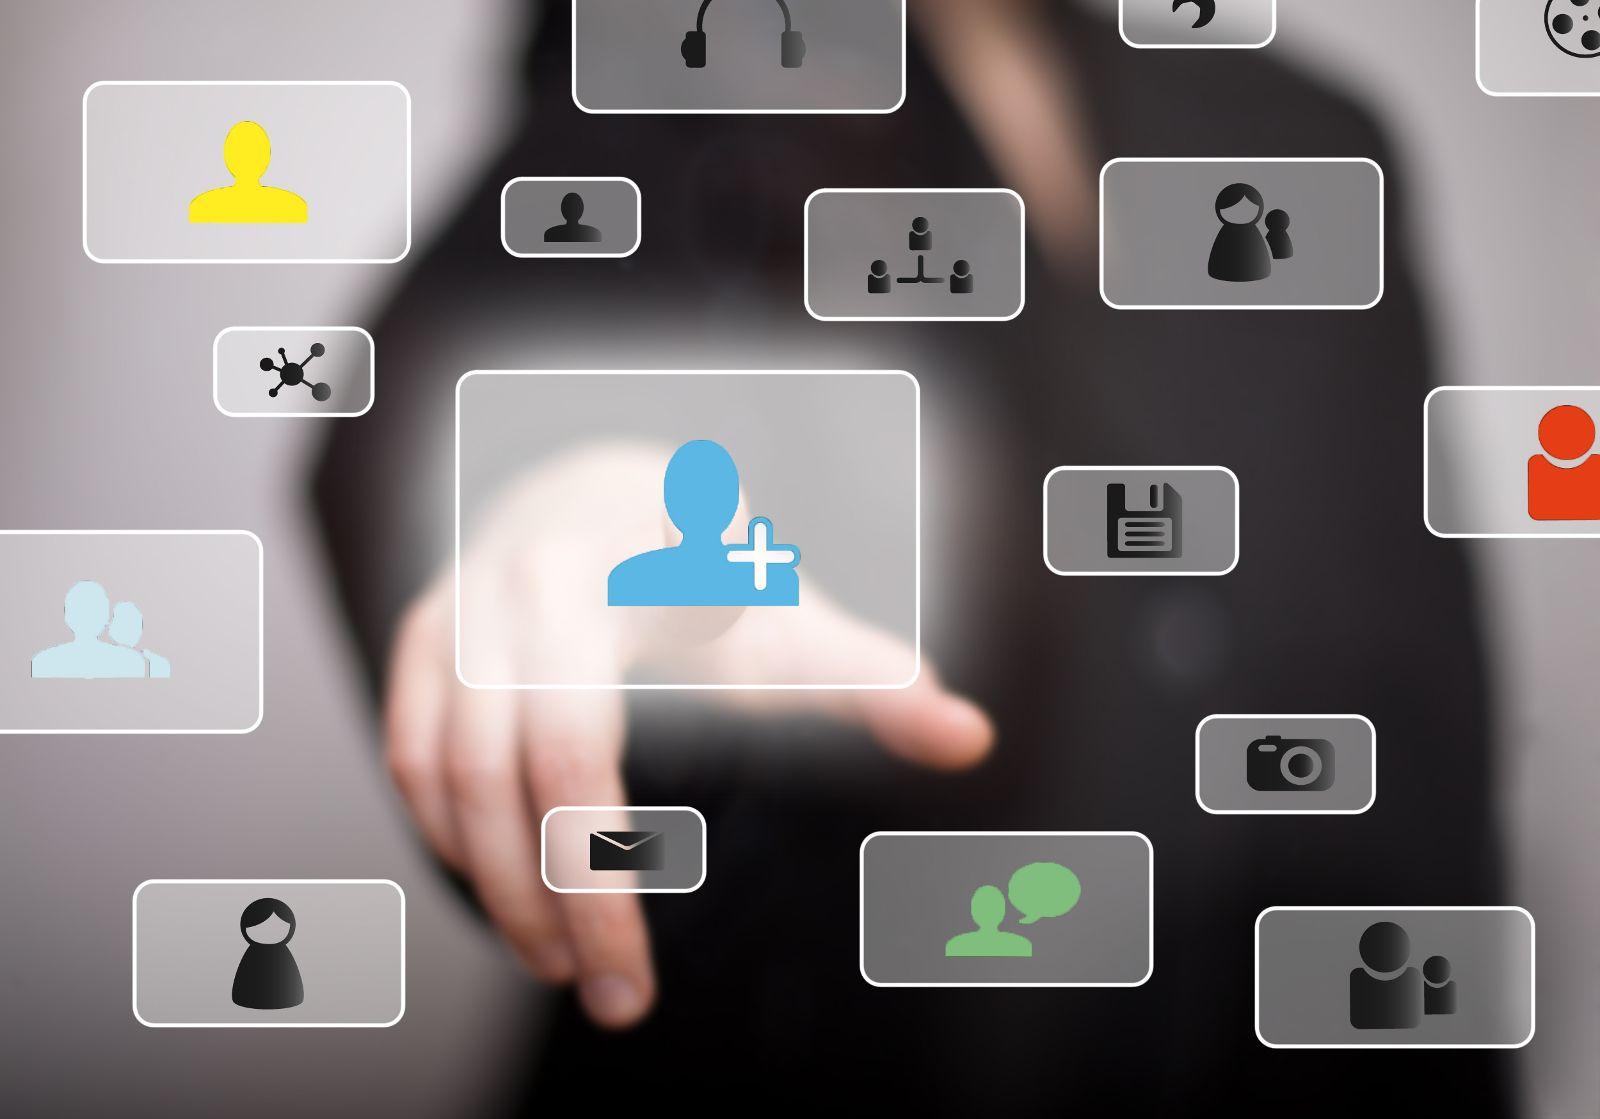 https://www.promotionmagazine.it/wp/wp-content/uploads/2013/05/social-aspect.jpg